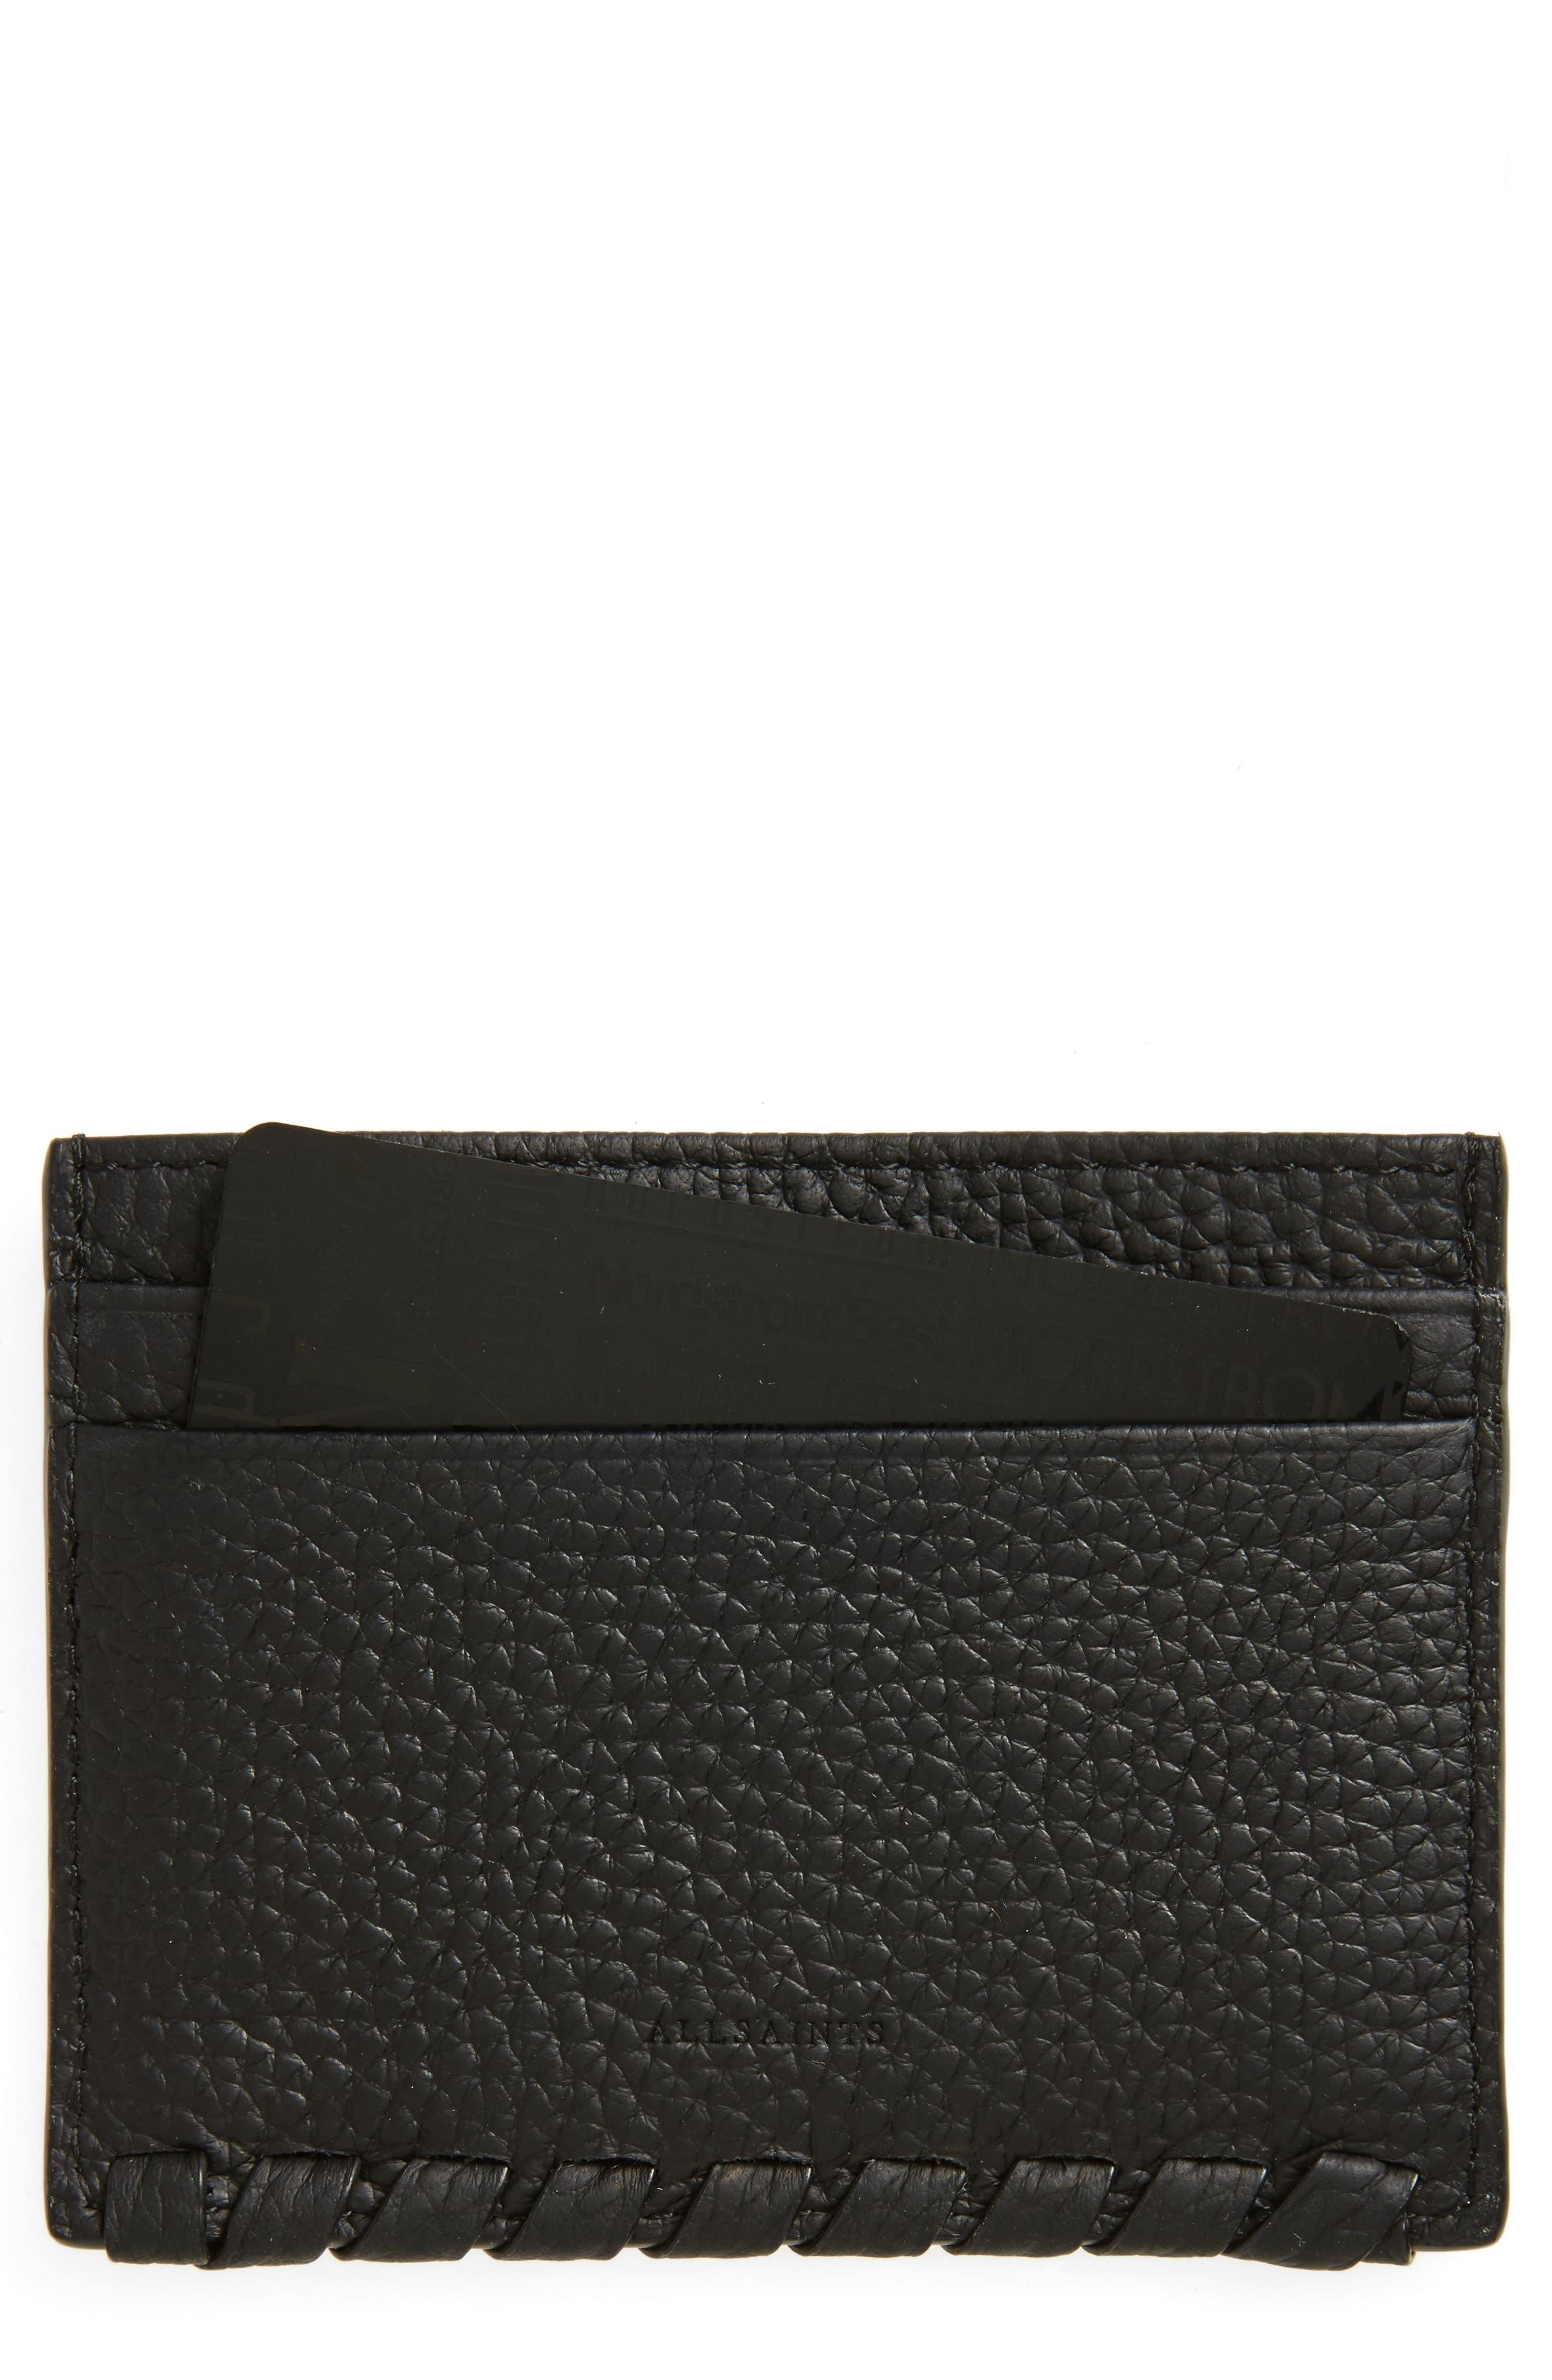 Kita Pebbled Leather Card Case,                         Main,                         color, Black